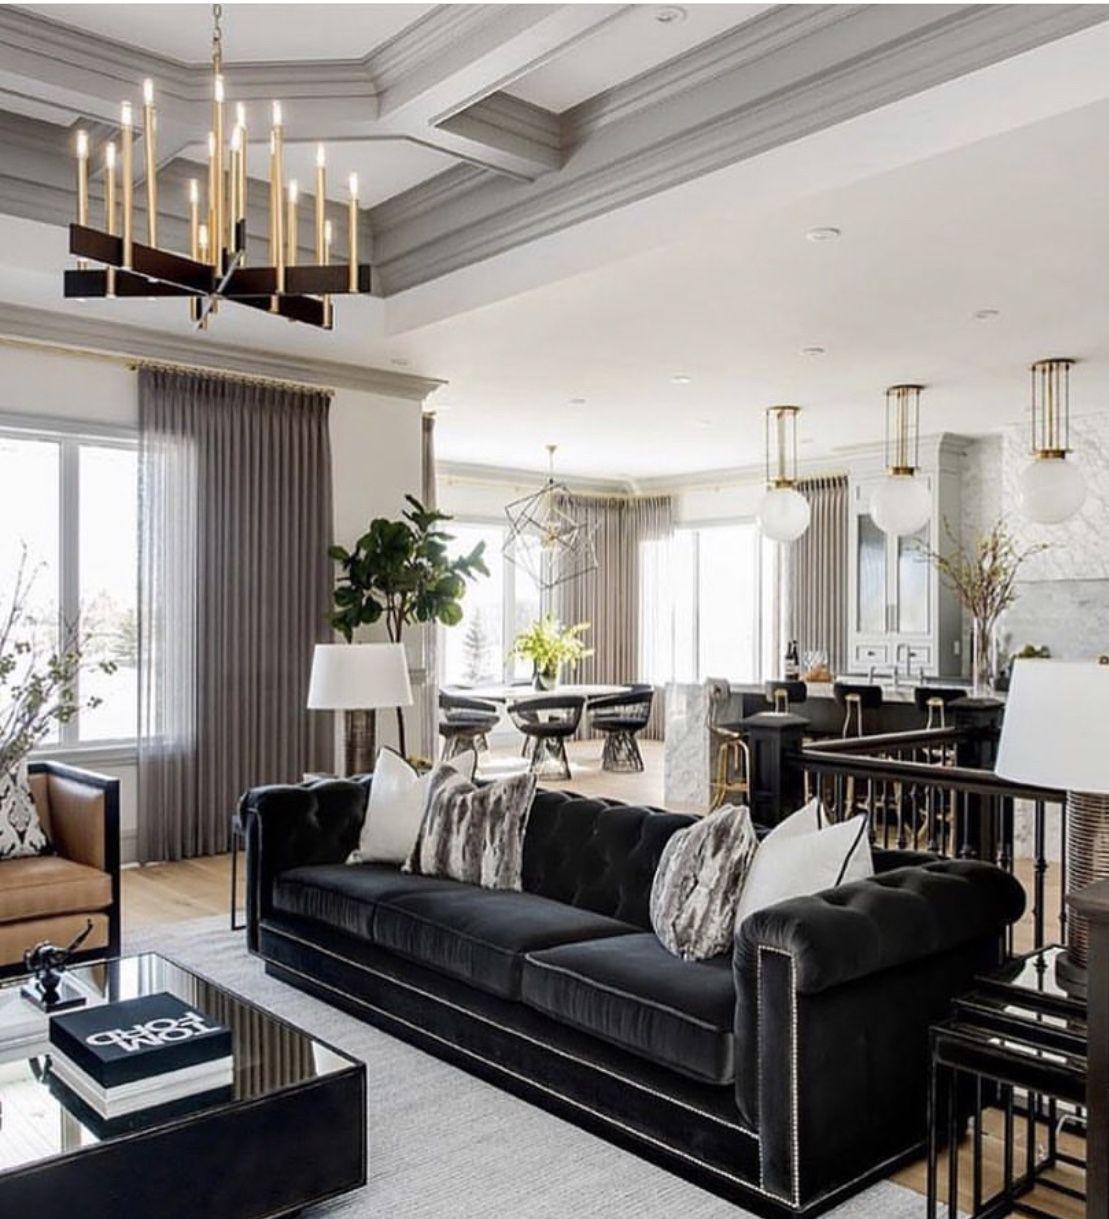 Black Velvet Sofa Chesterfield Artdecostyle Blackandwhite Livingroomdecor Restoratio Interior Design Living Room Living Room Interior Living Room Designs